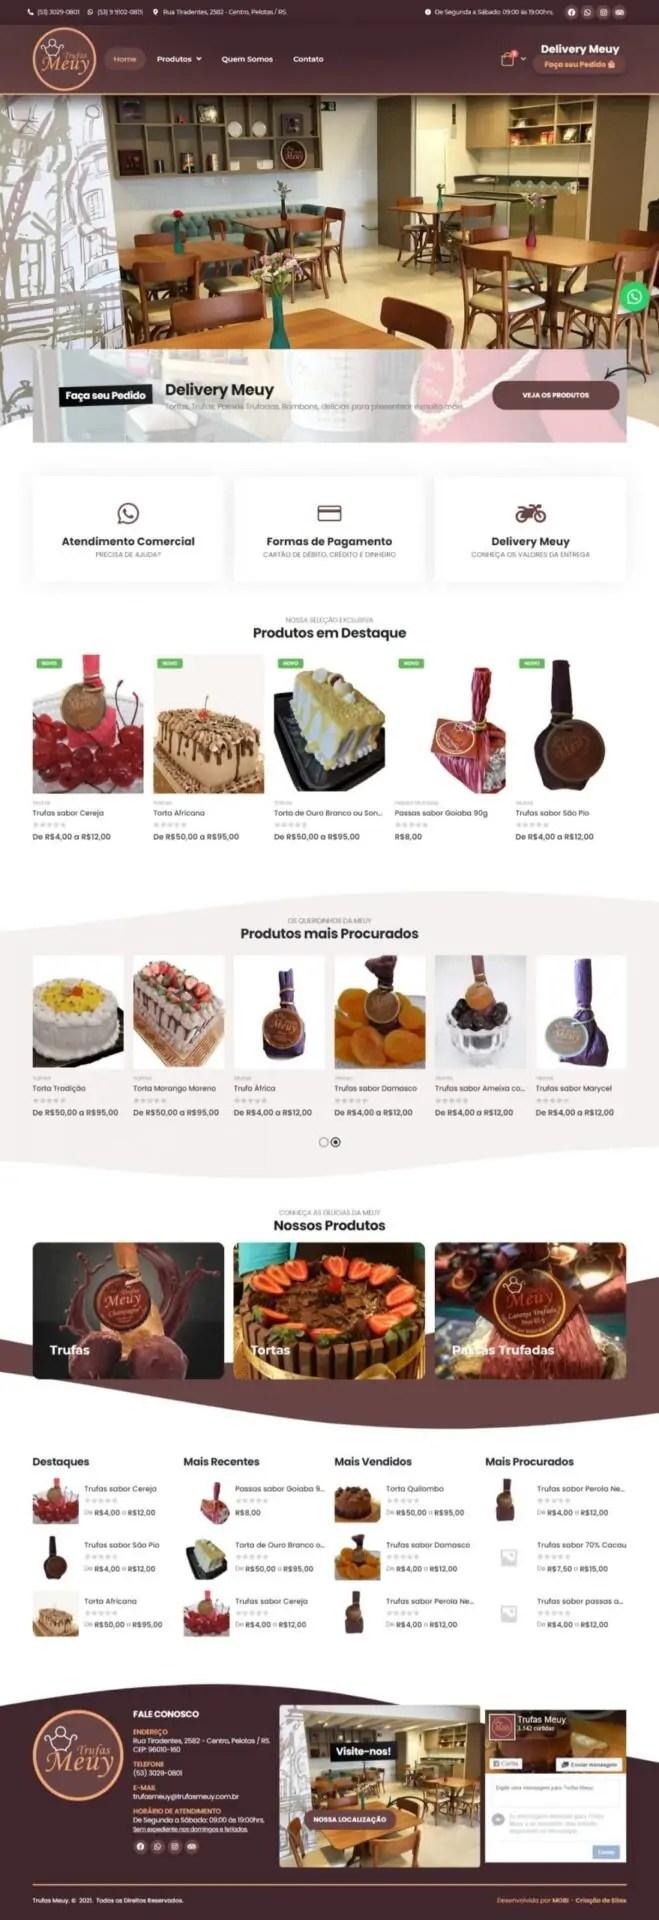 Captura da Web_19-2-2021_121946_www.trufasmeuy.com.br